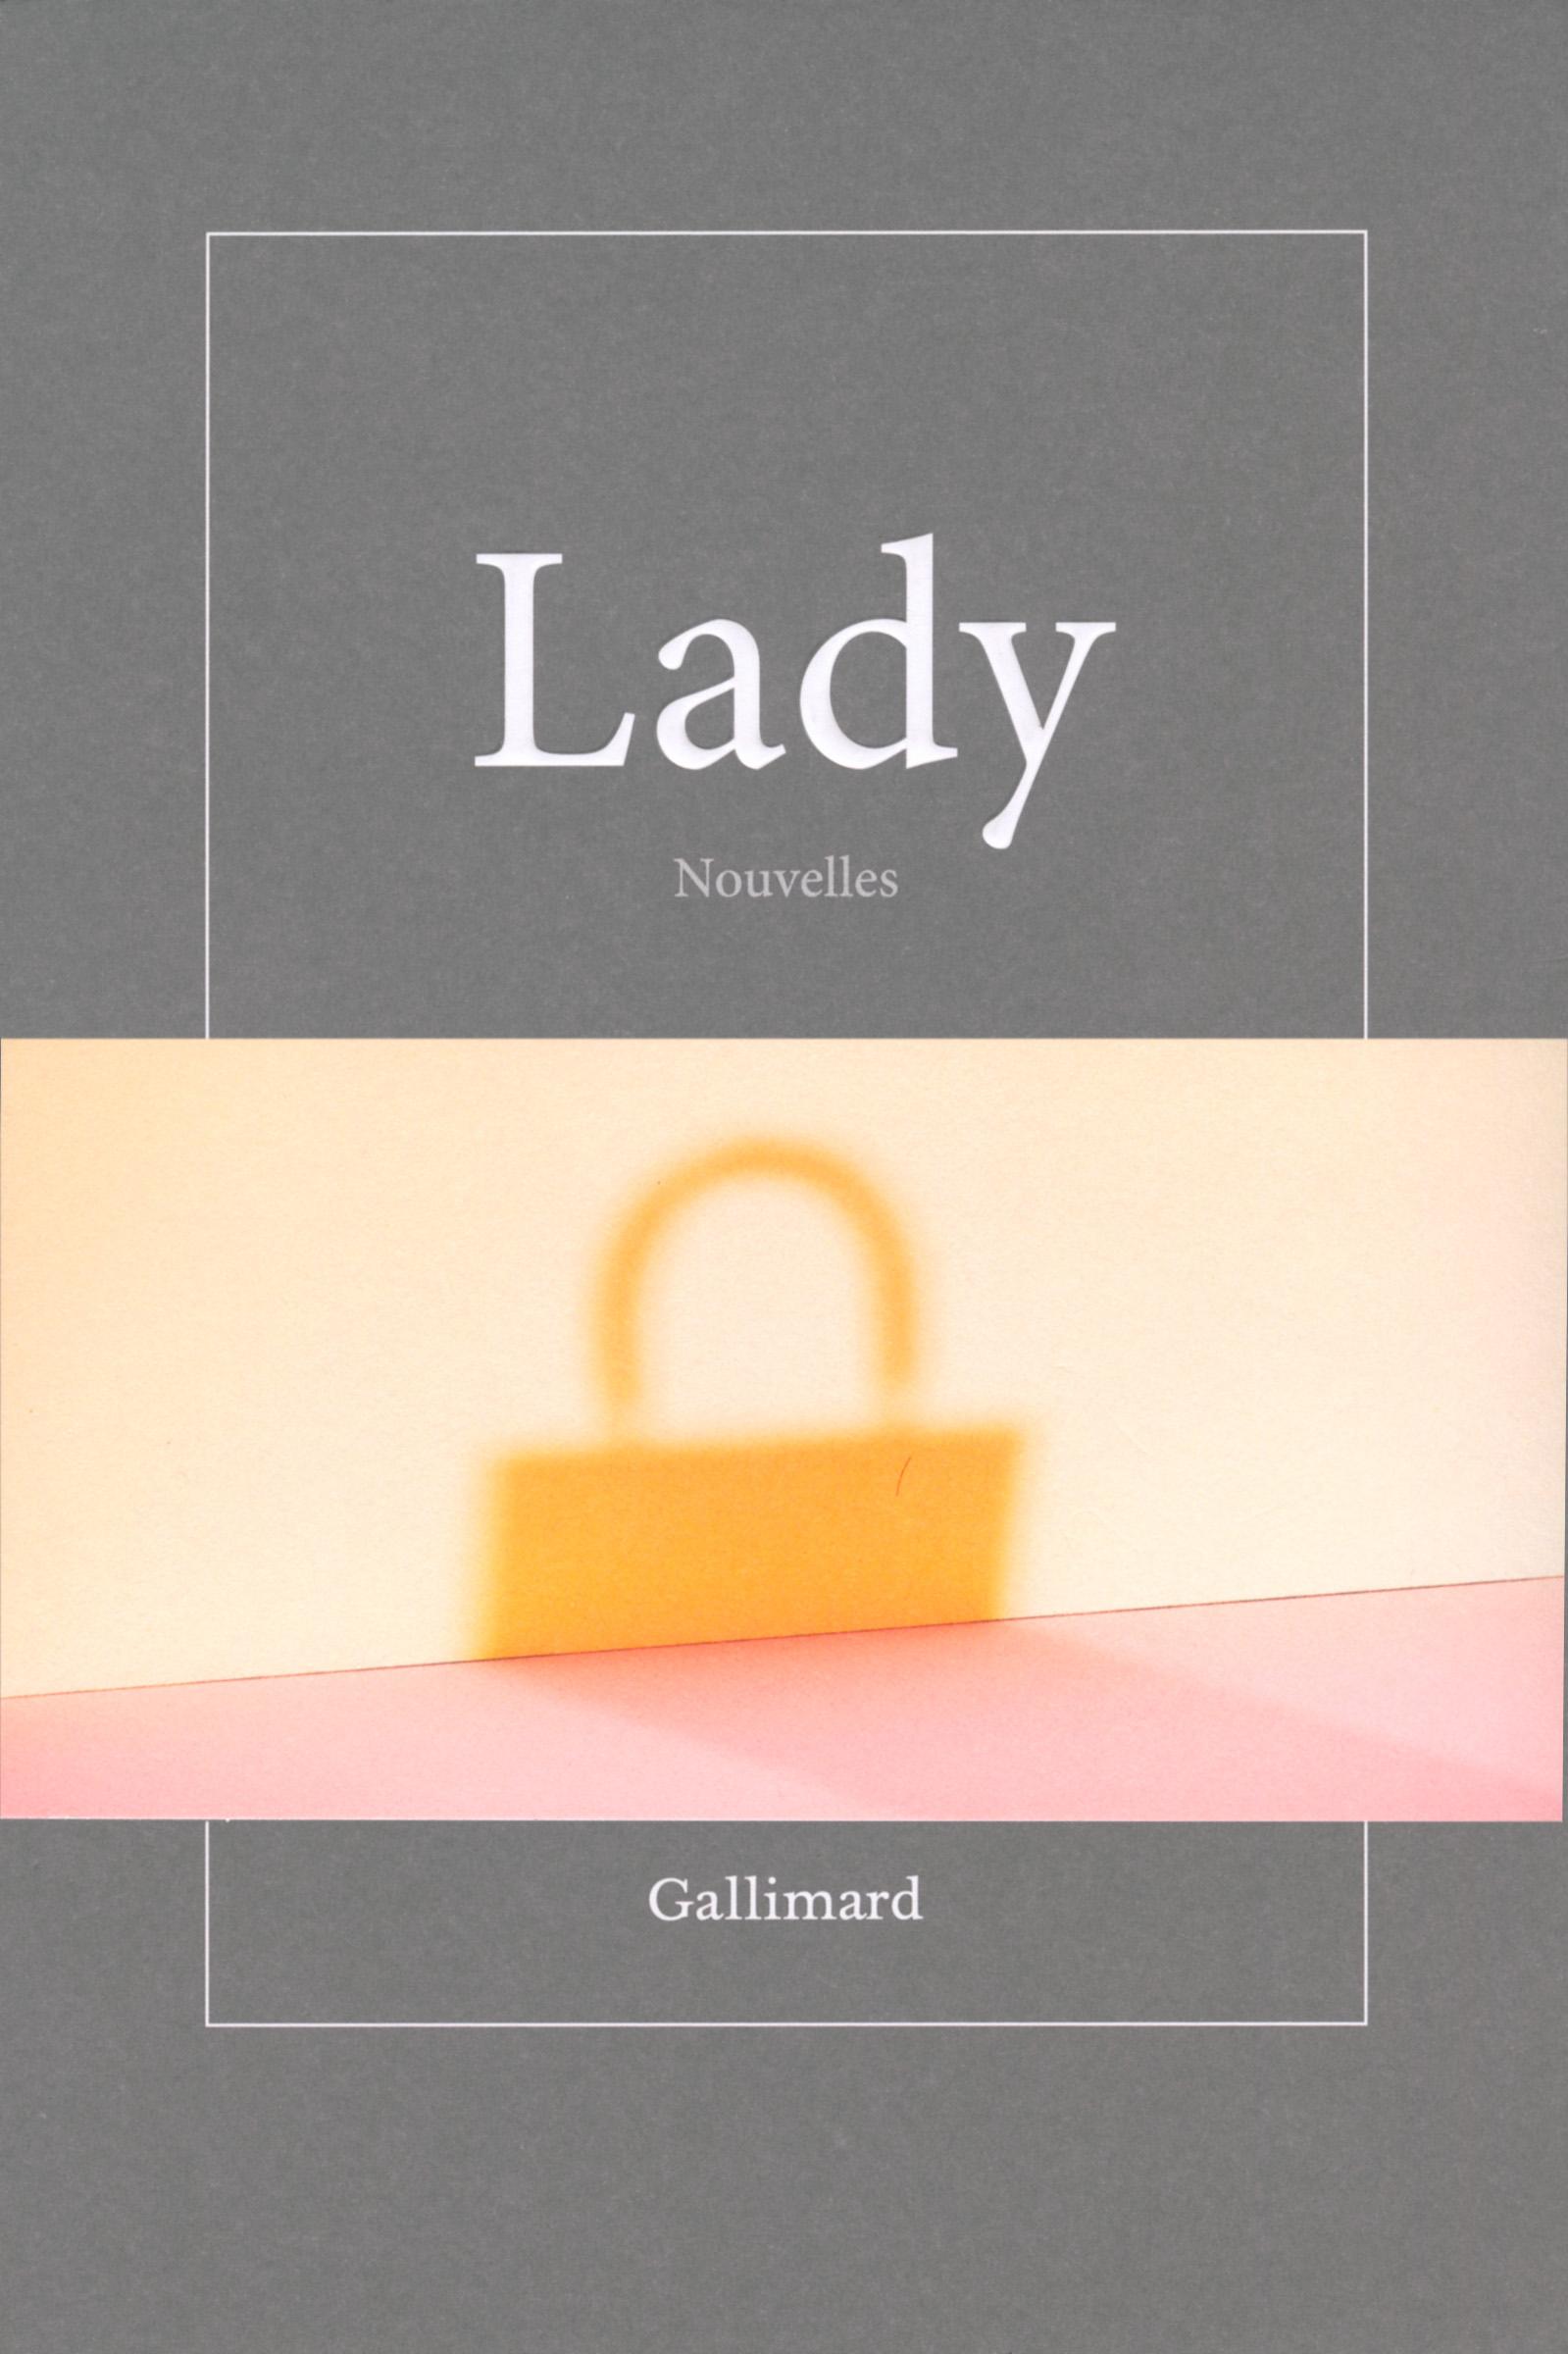 Lady Site Littérature Hors Série Gallimard uTlK1JcF3